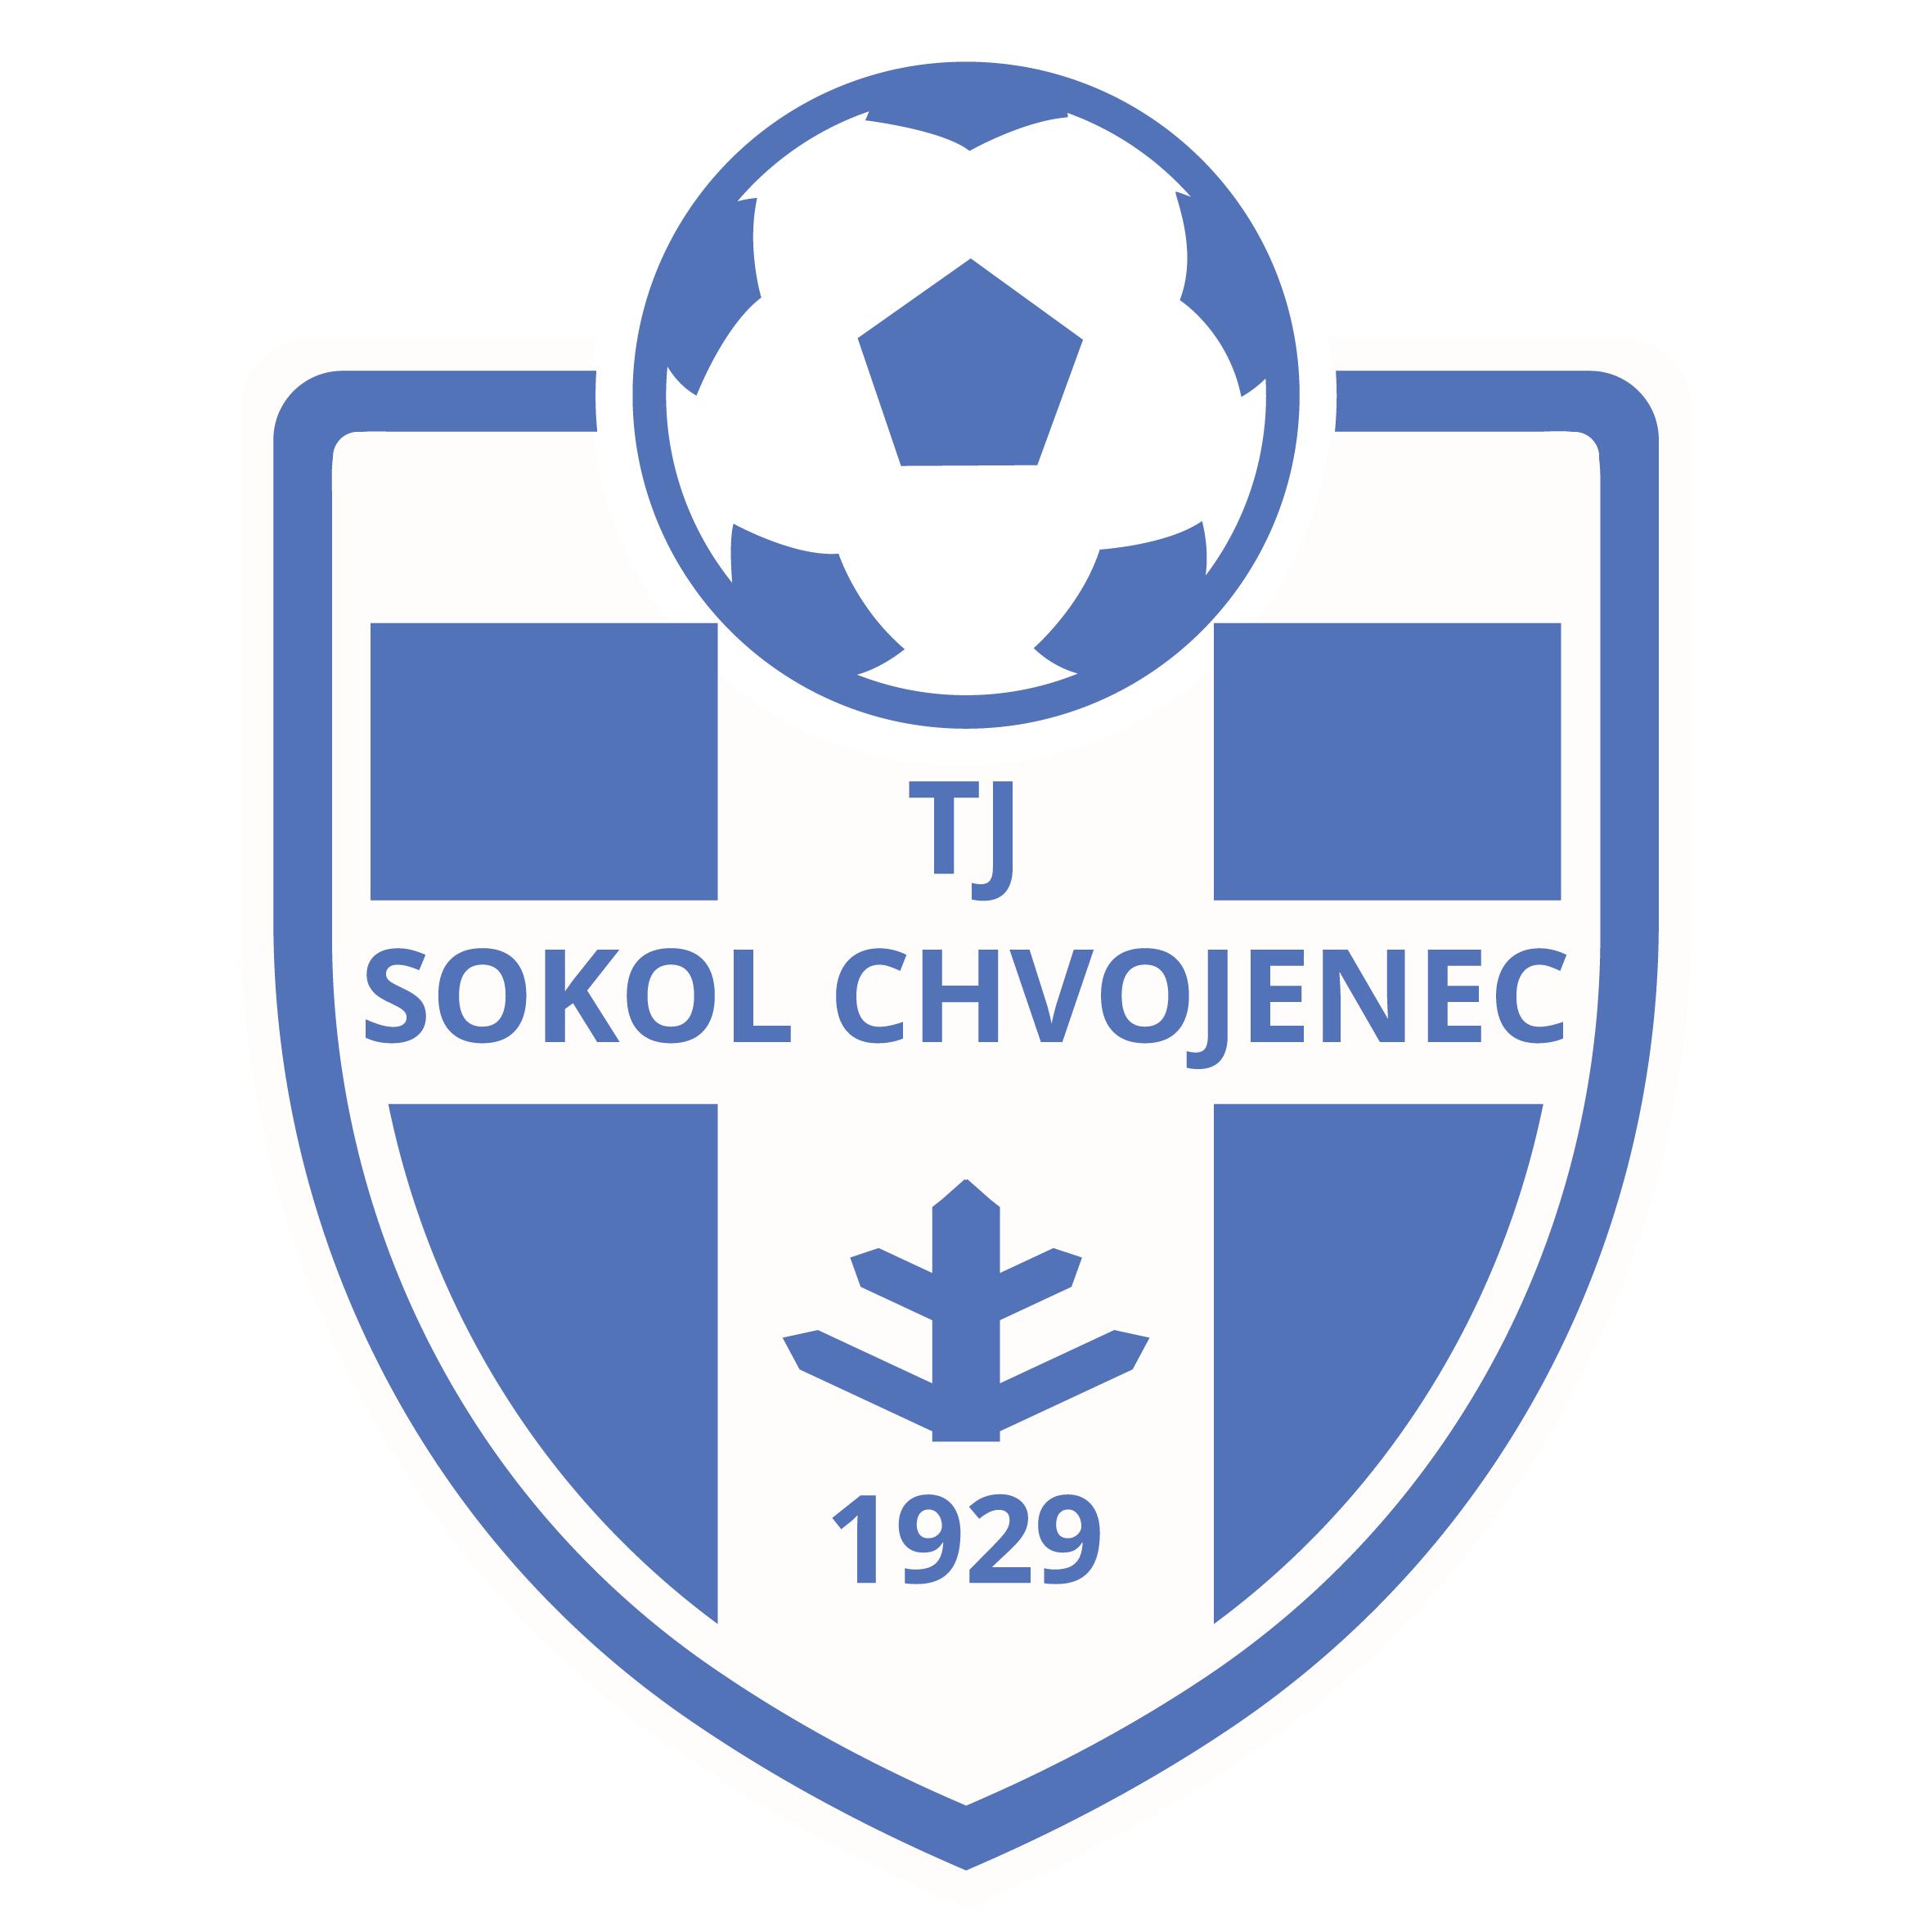 TJ Sokol Chvojenec